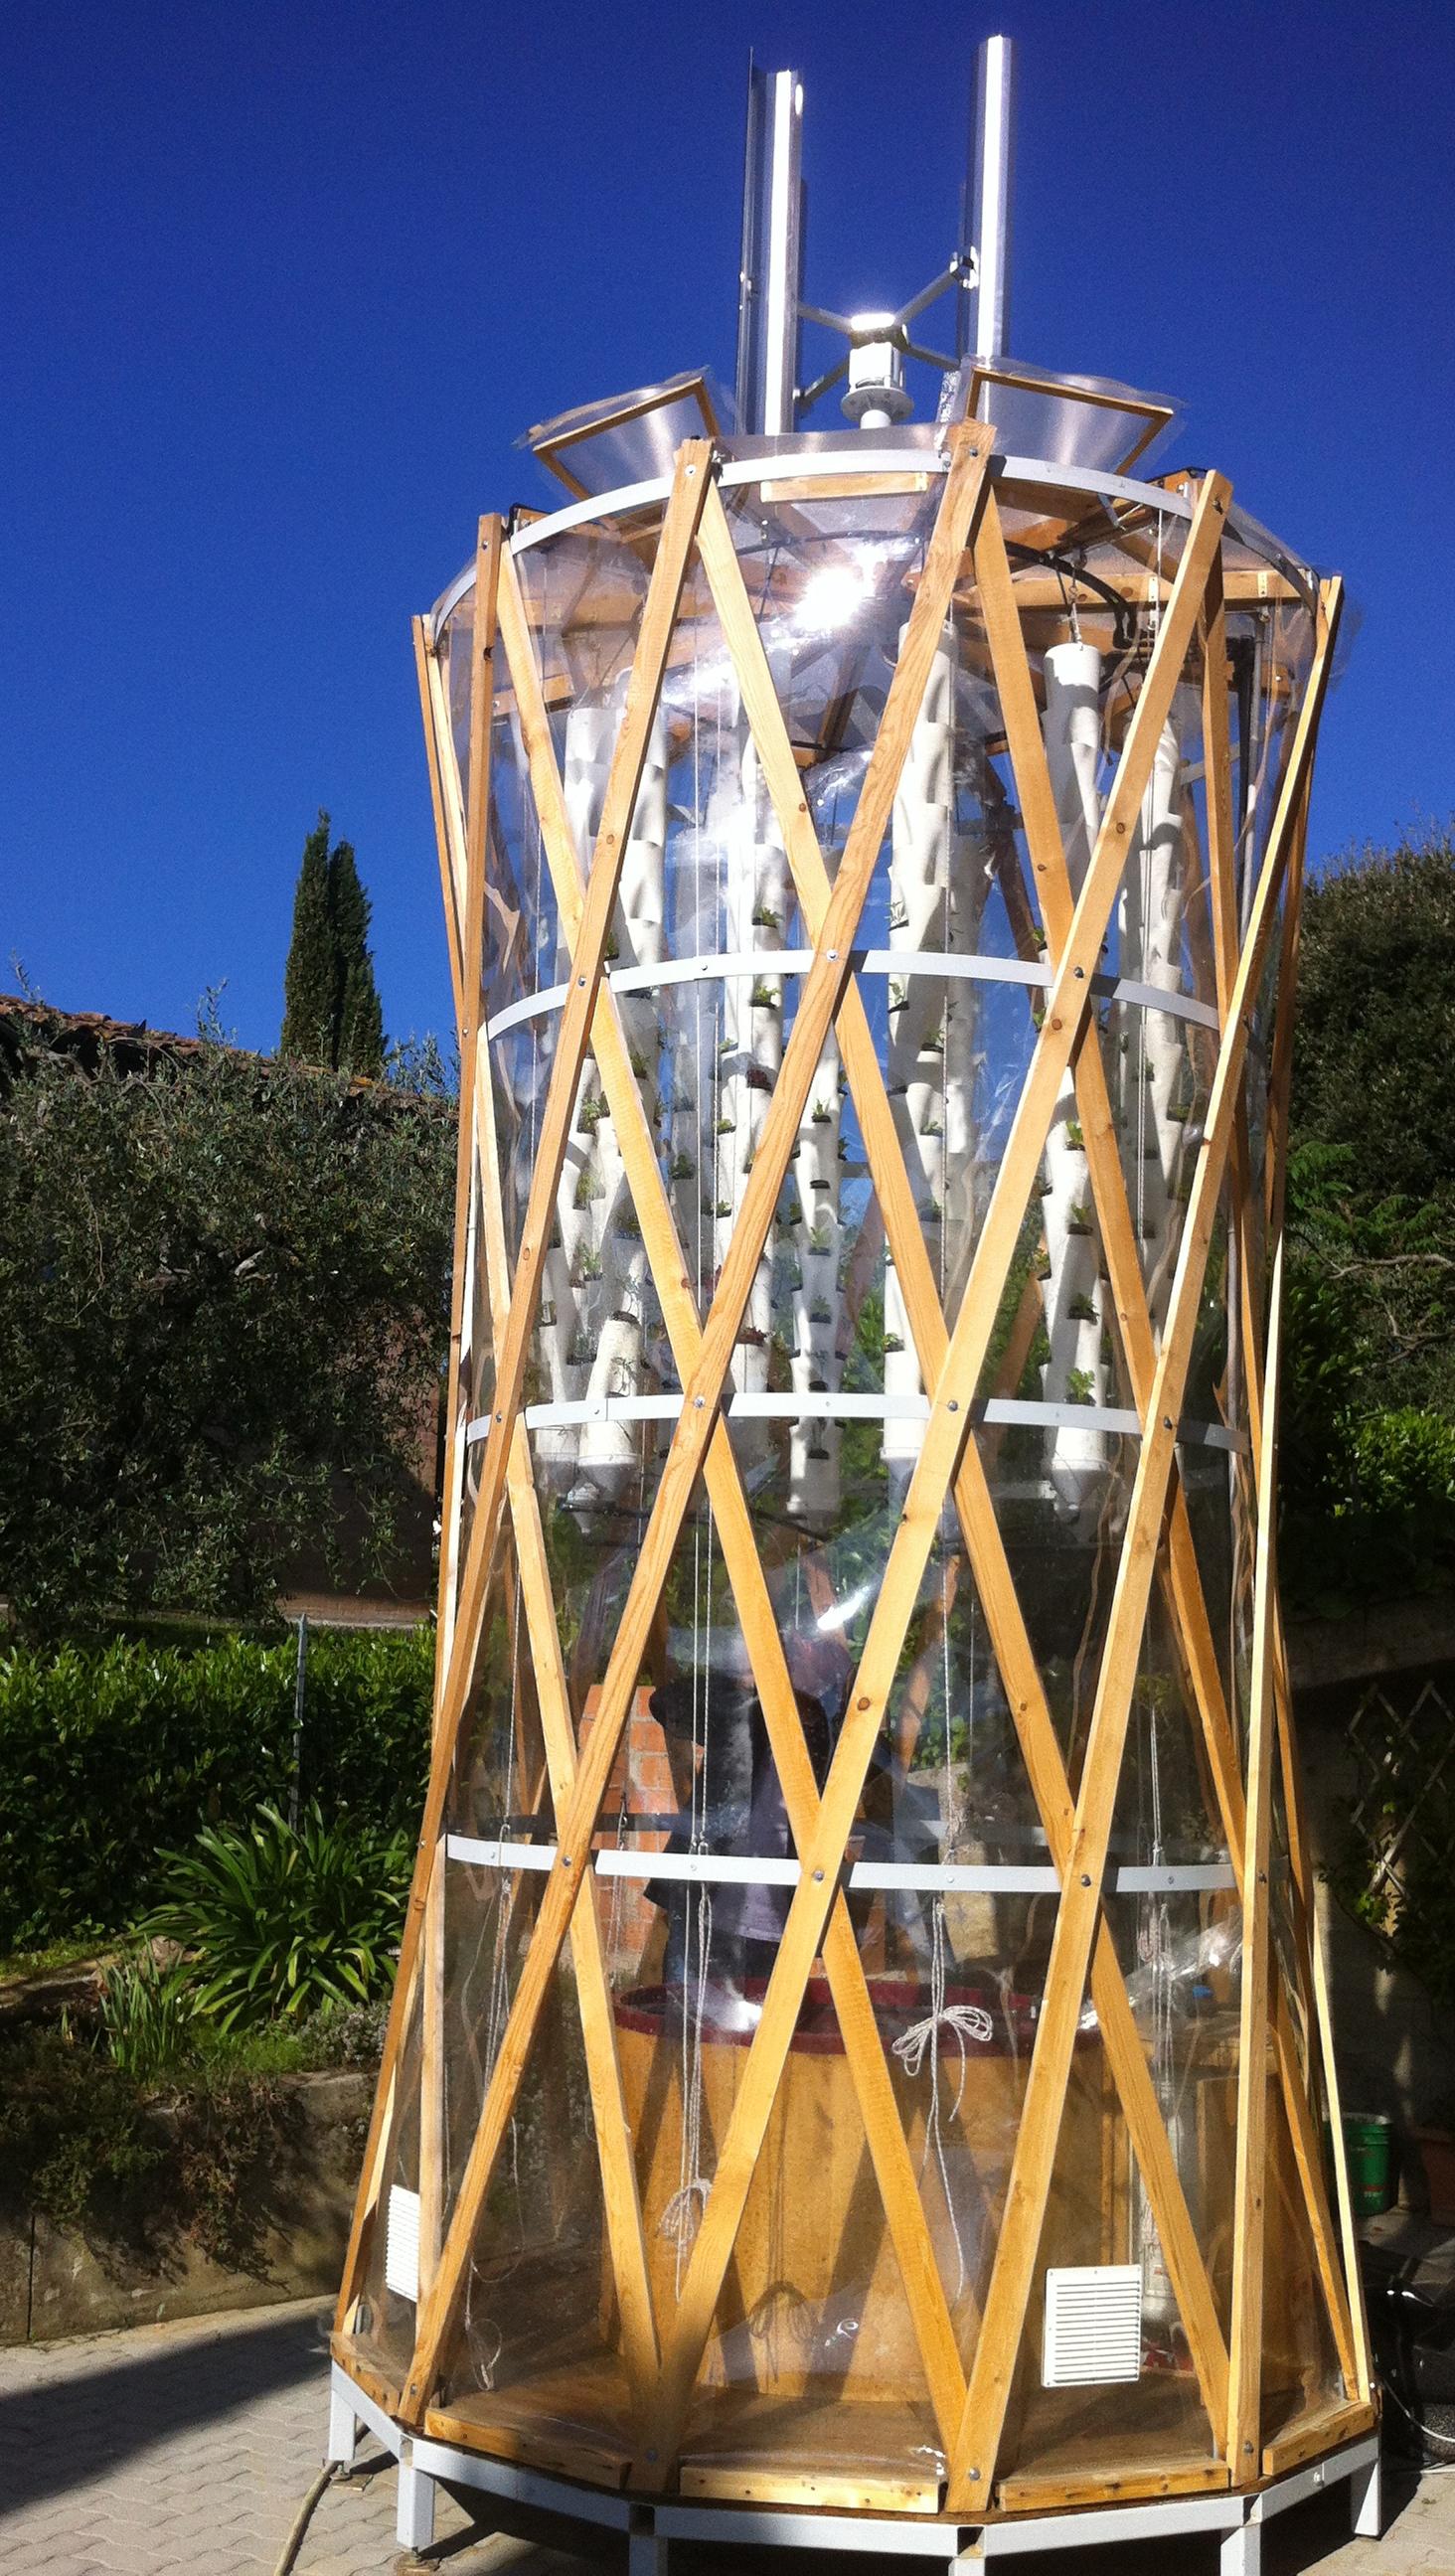 verticalfarmacquaponica.jpg